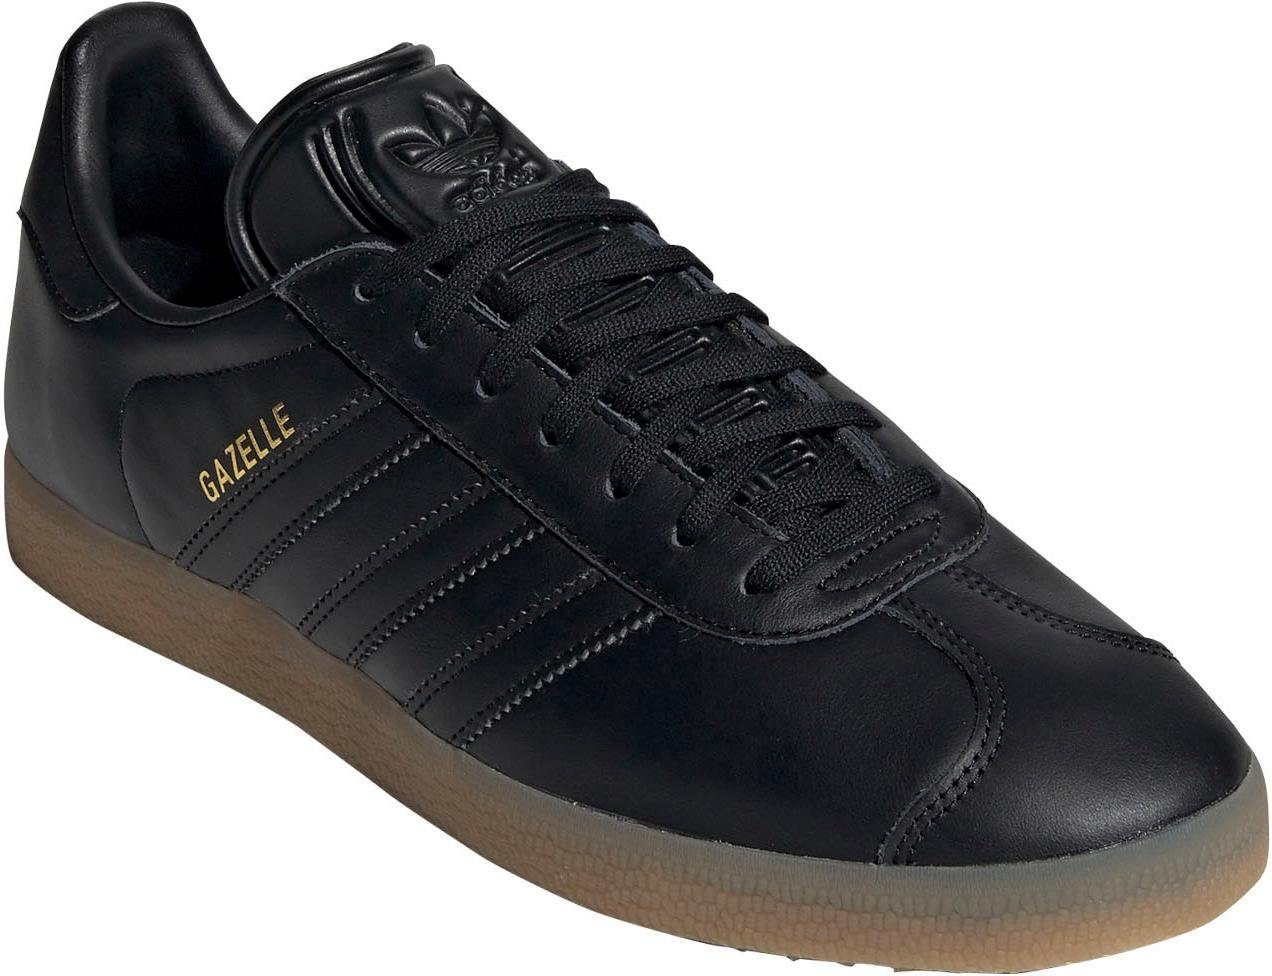 adidas Gazelle sneakers koop je online al vanaf € 72,99 | OTTO